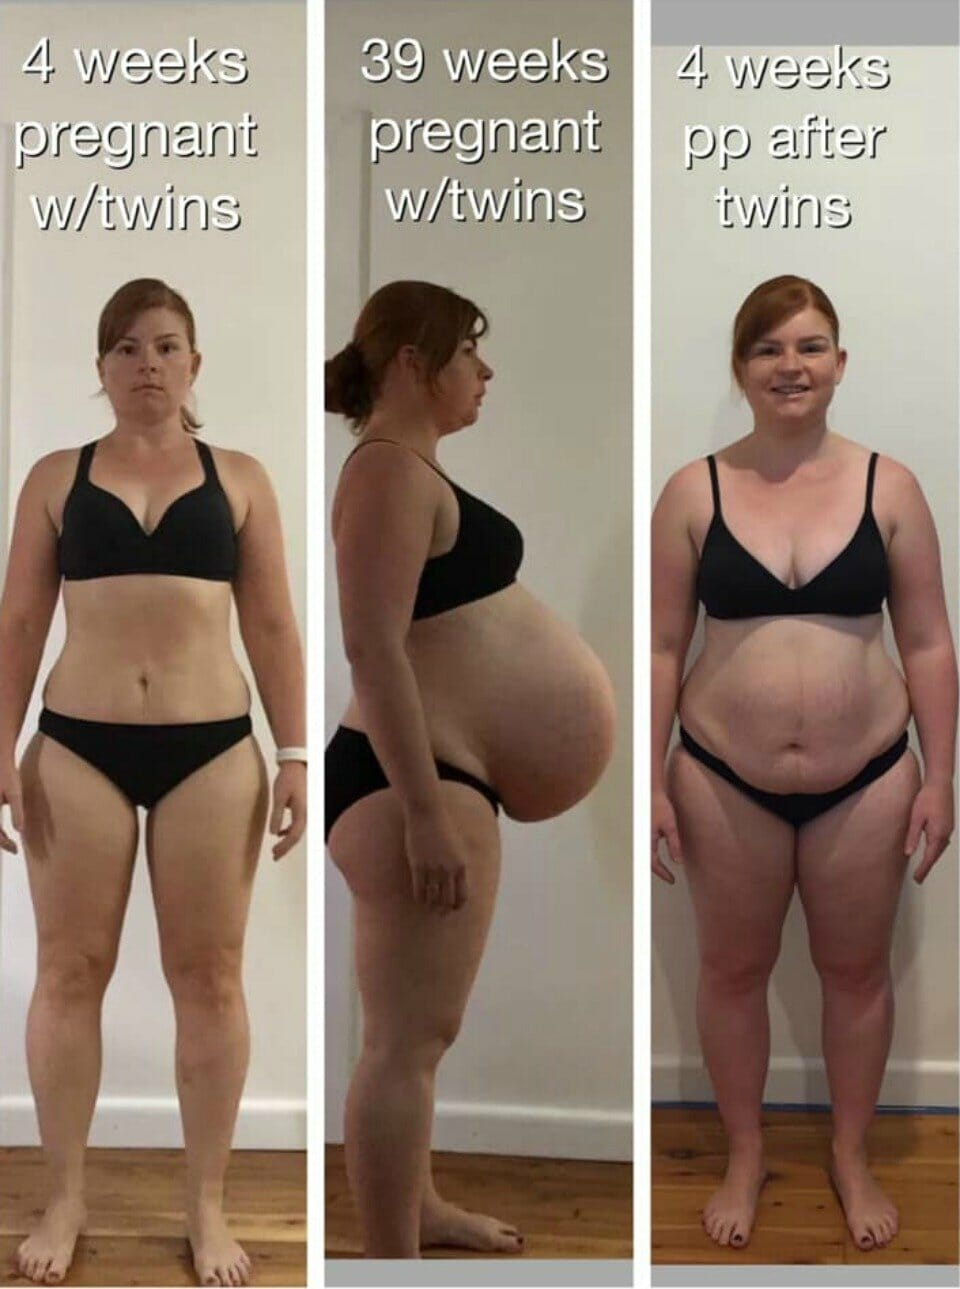 Stacey-Webb-twin-pregnancy-progress